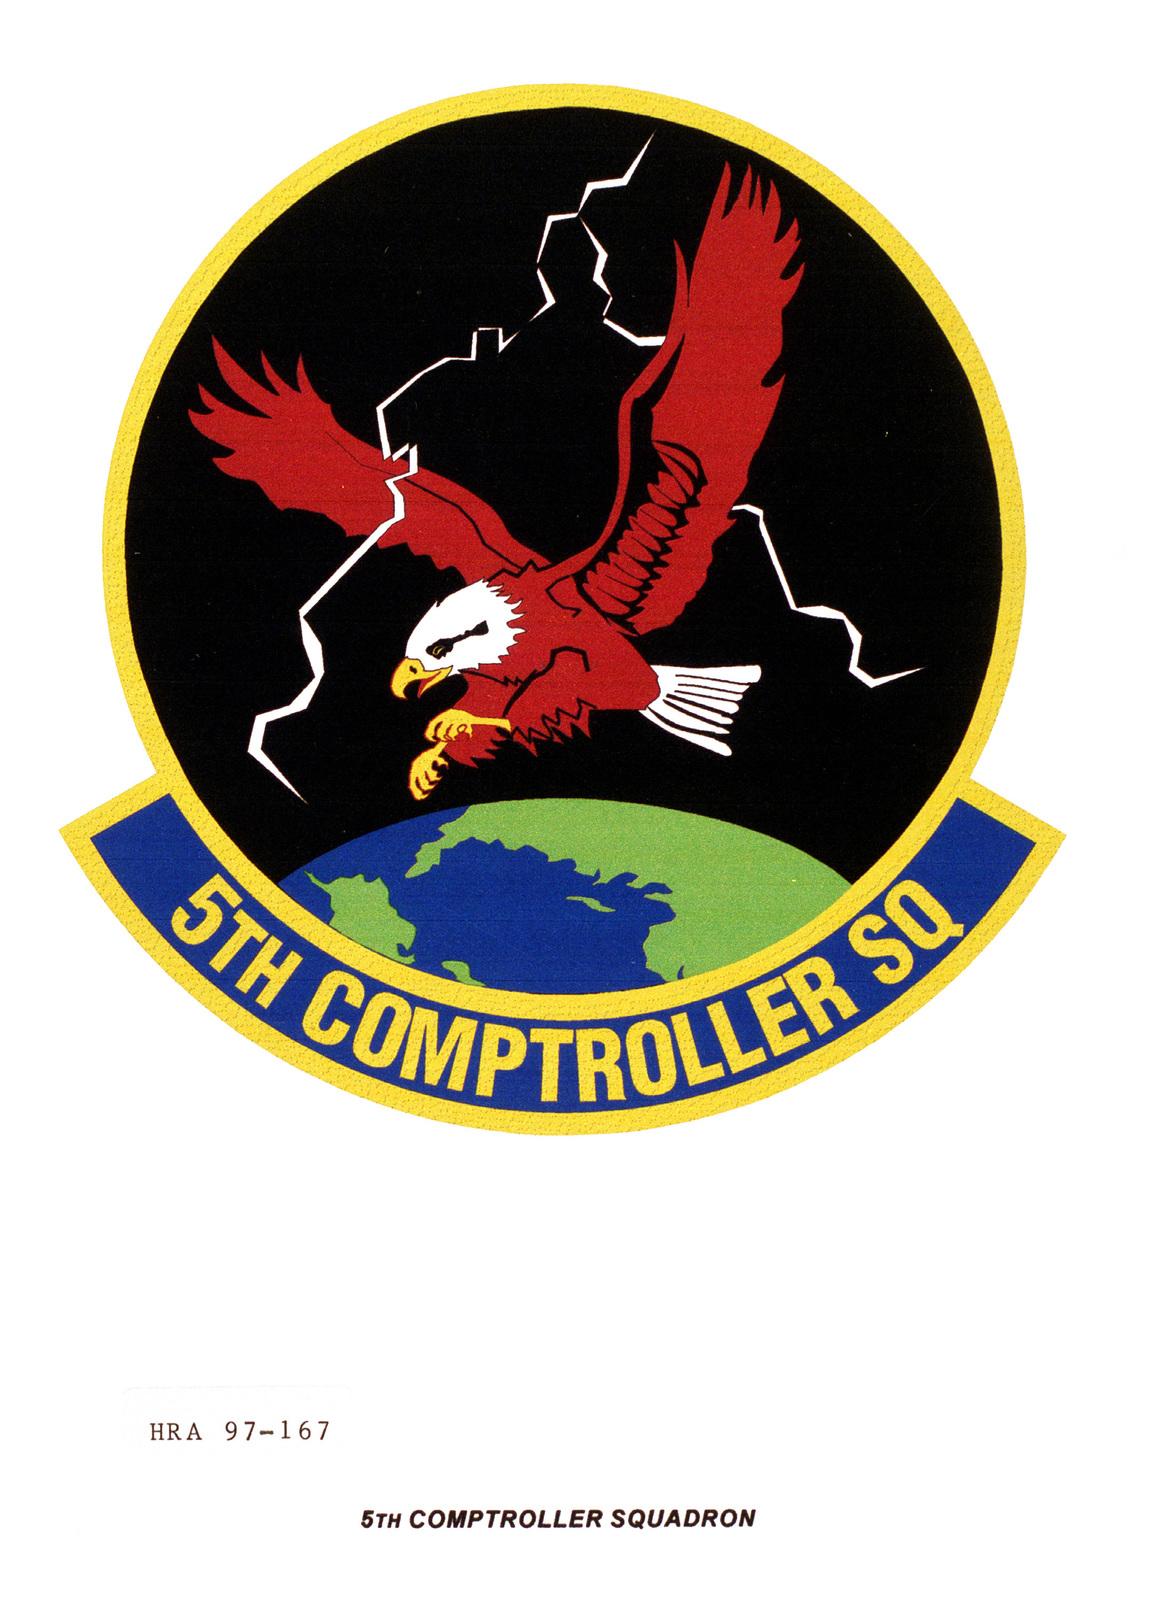 Air Force Organizational Emblem: 5th Comptroller Squadron, Air Combat Command